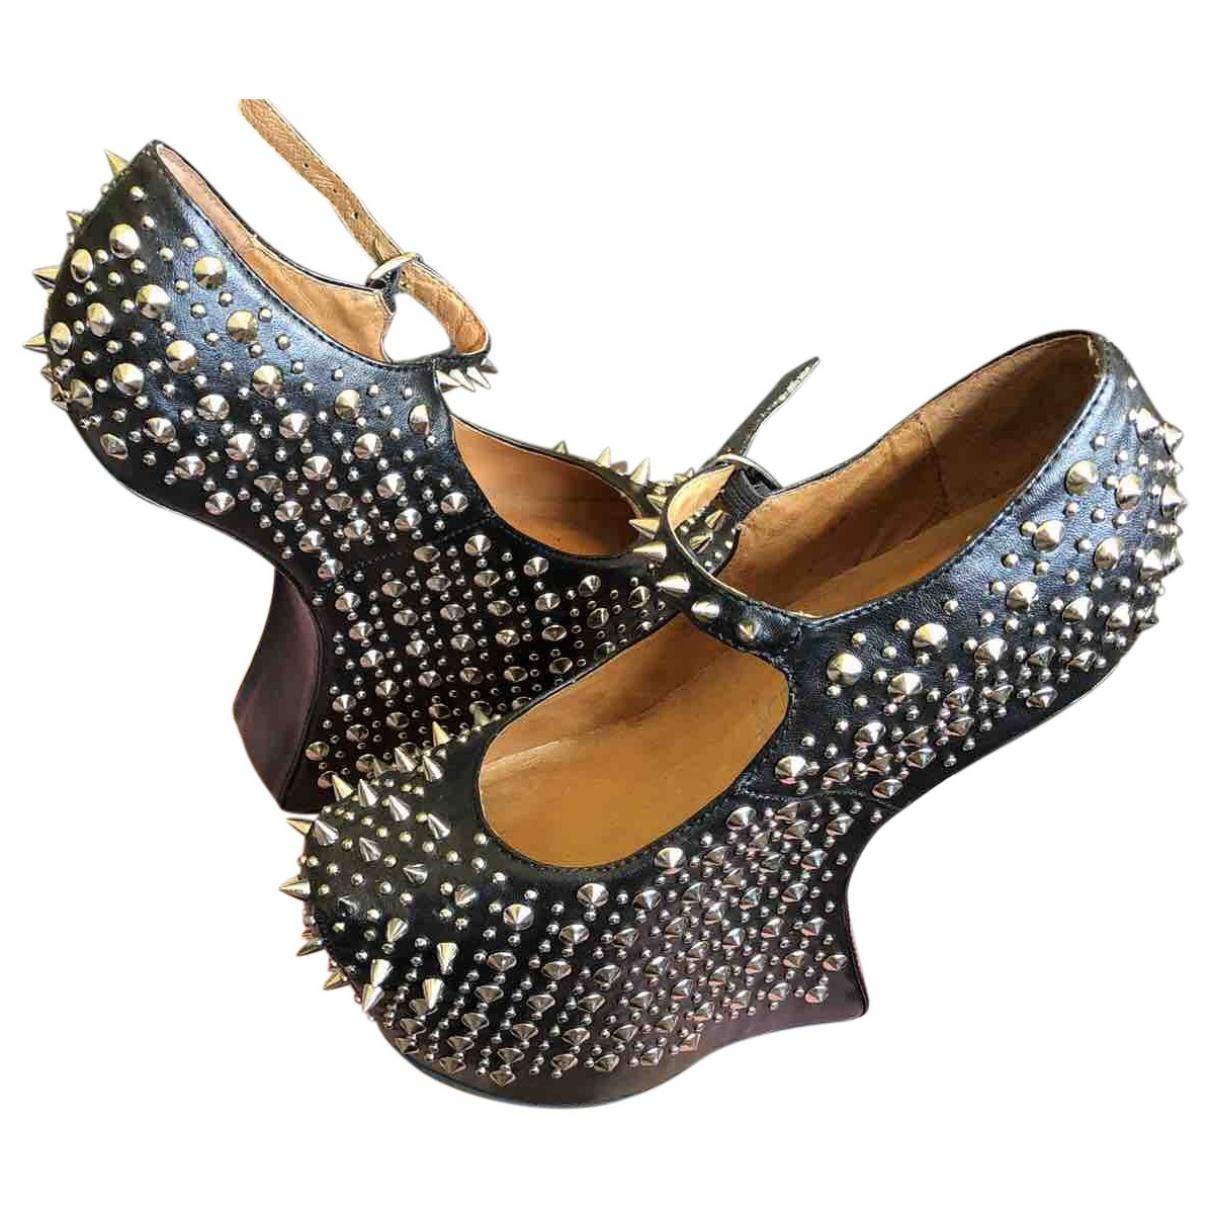 Jeffrey Campbell \N Black Leather Heels for Women 3 UK